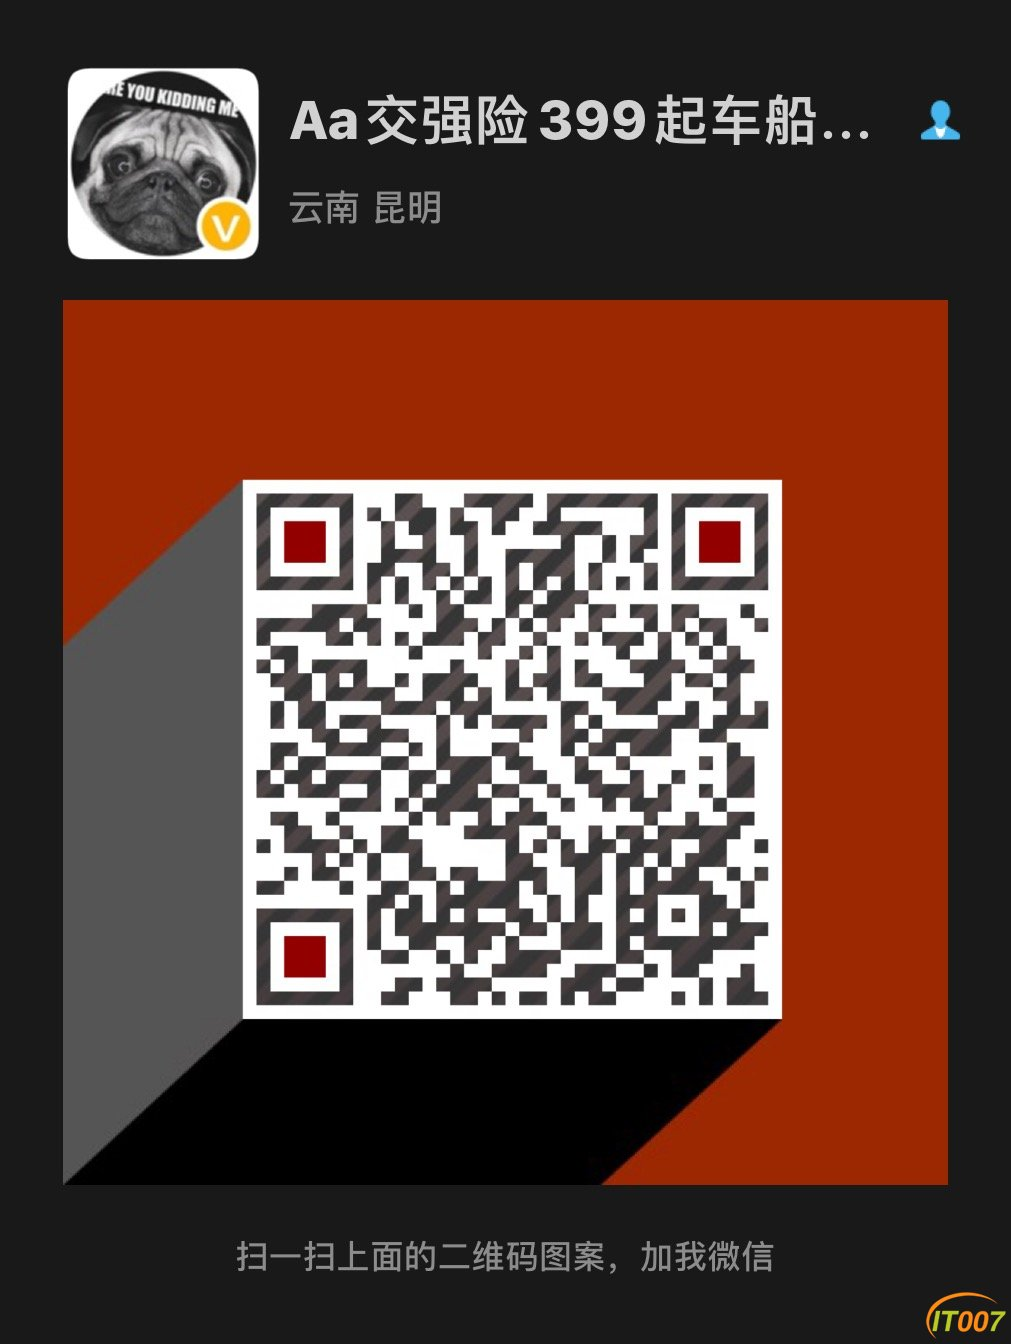 FCF37688-D894-4442-8670-F7F231A962E4.jpeg